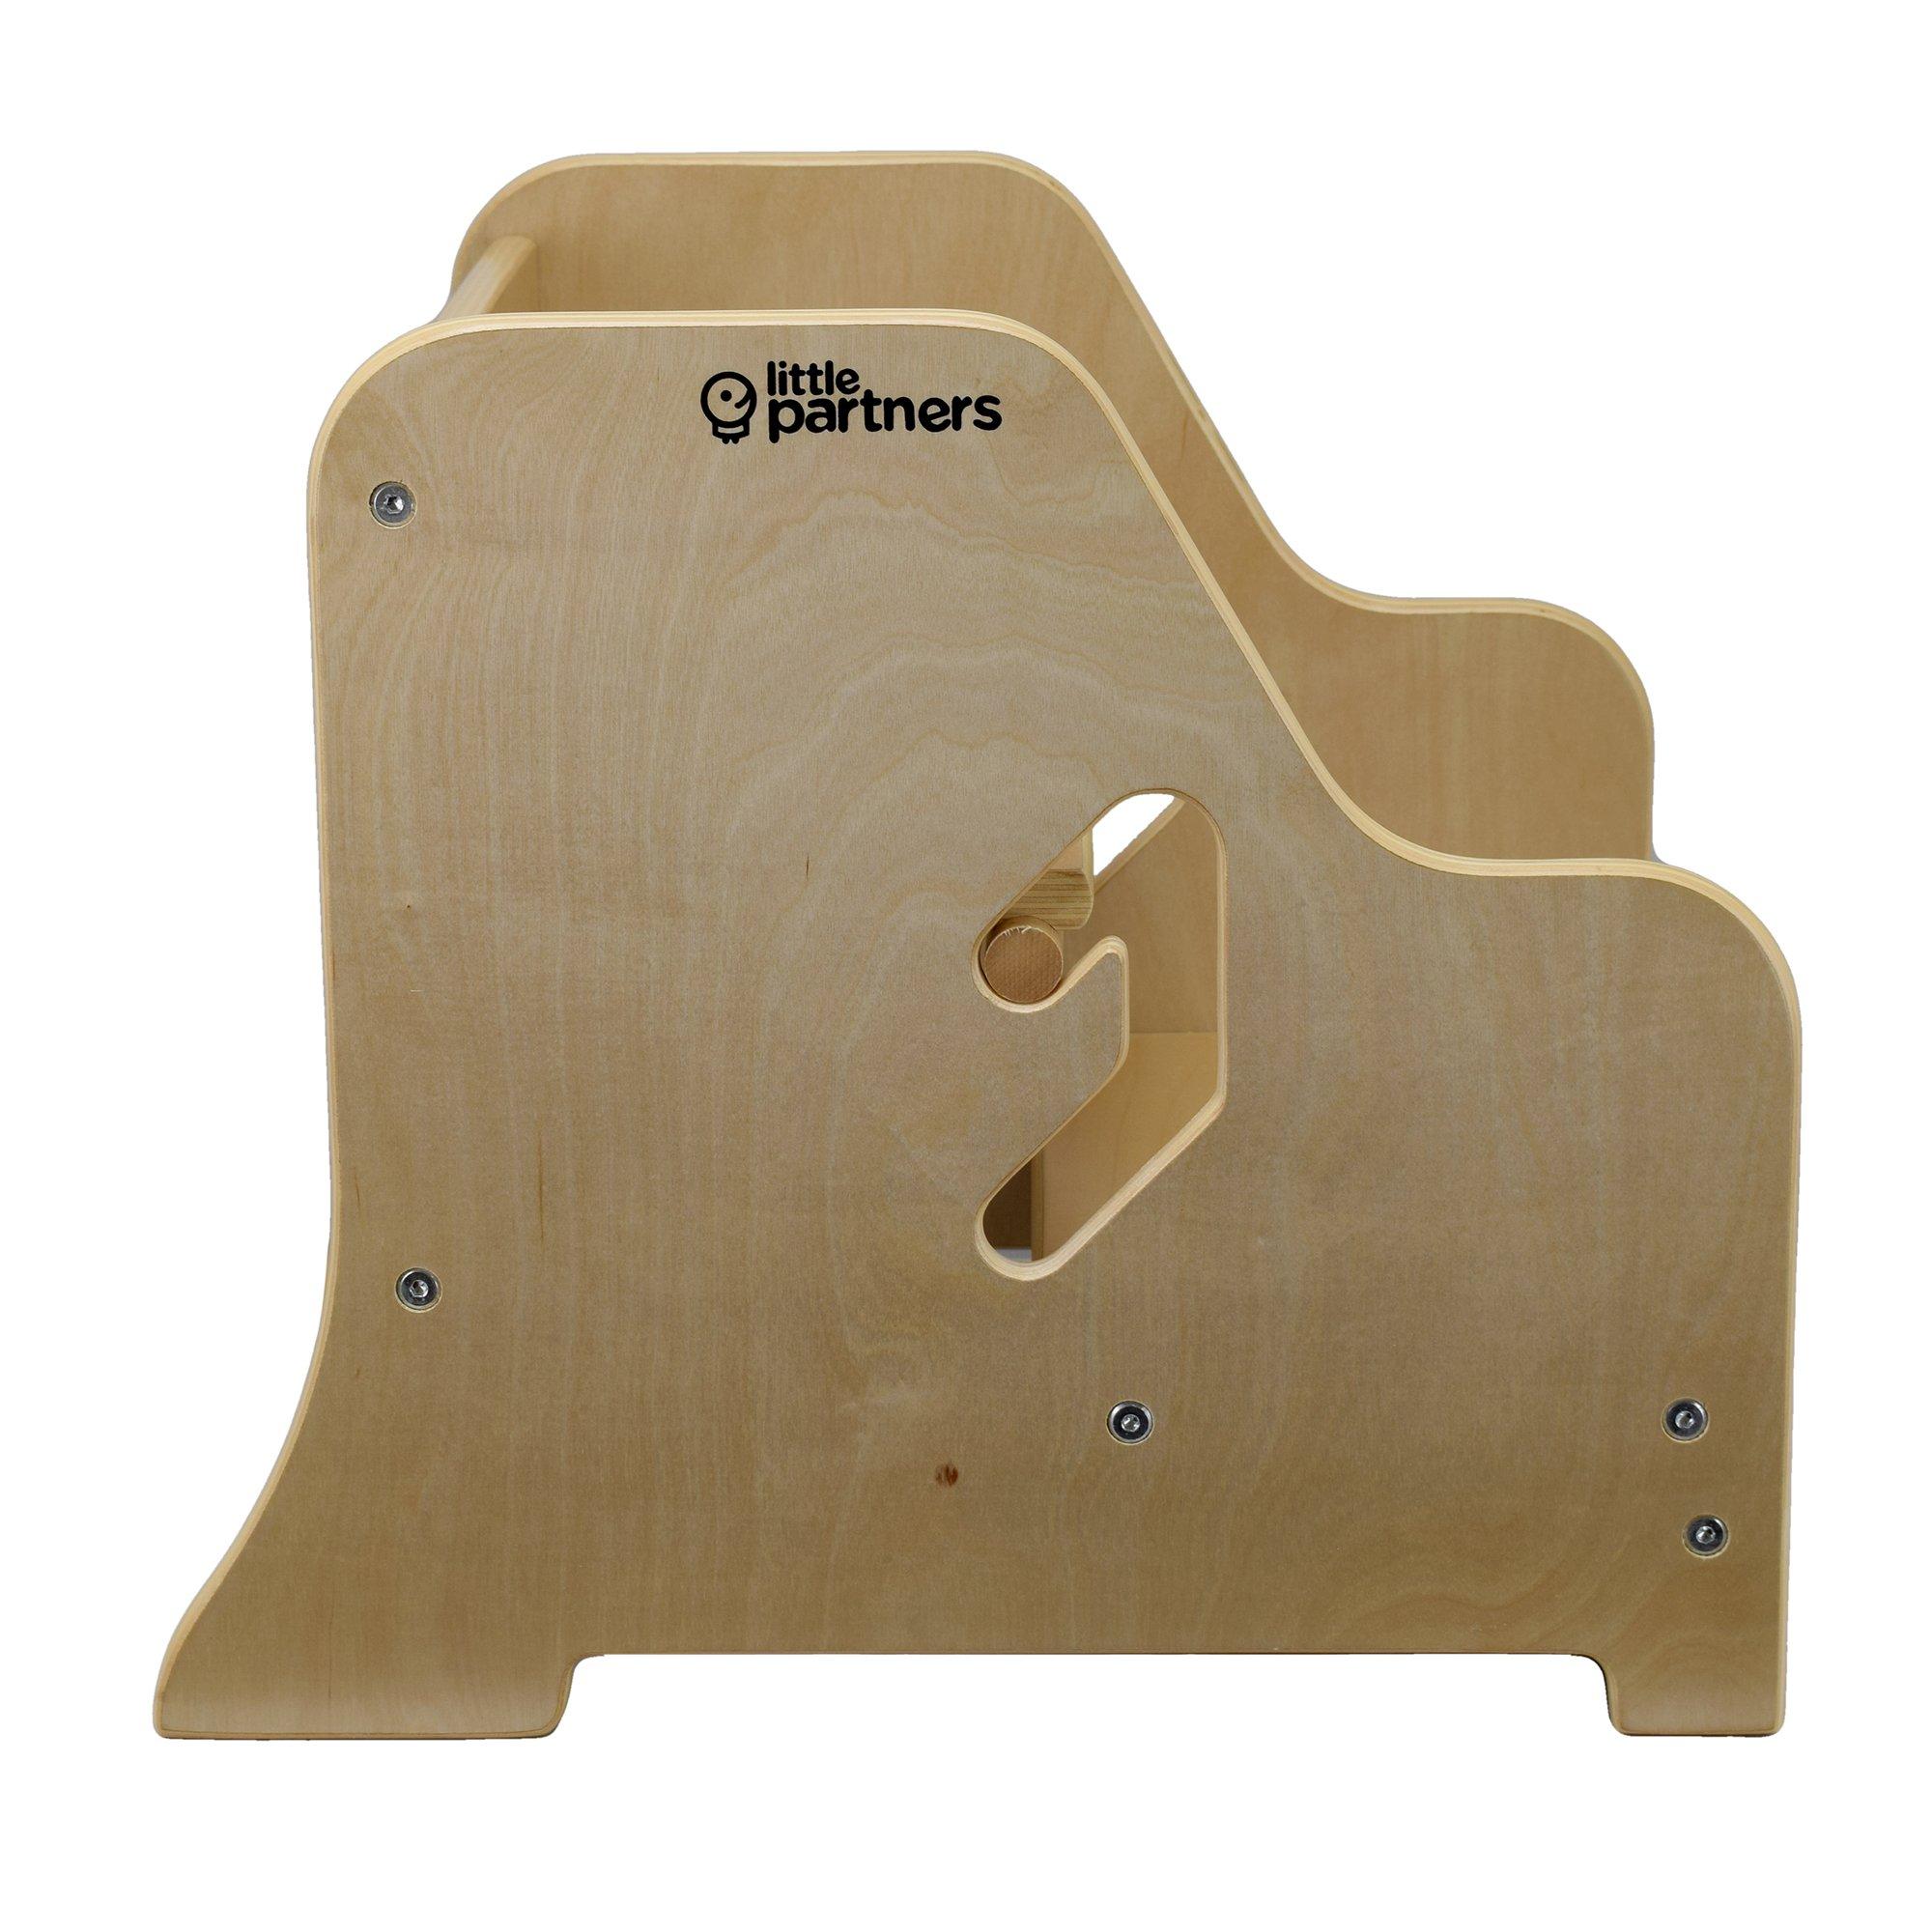 Little Partners Toddler Step Up Stool | 2 Step Adjustable Height for Kitchen, Bathroom or Nursery (Natural)